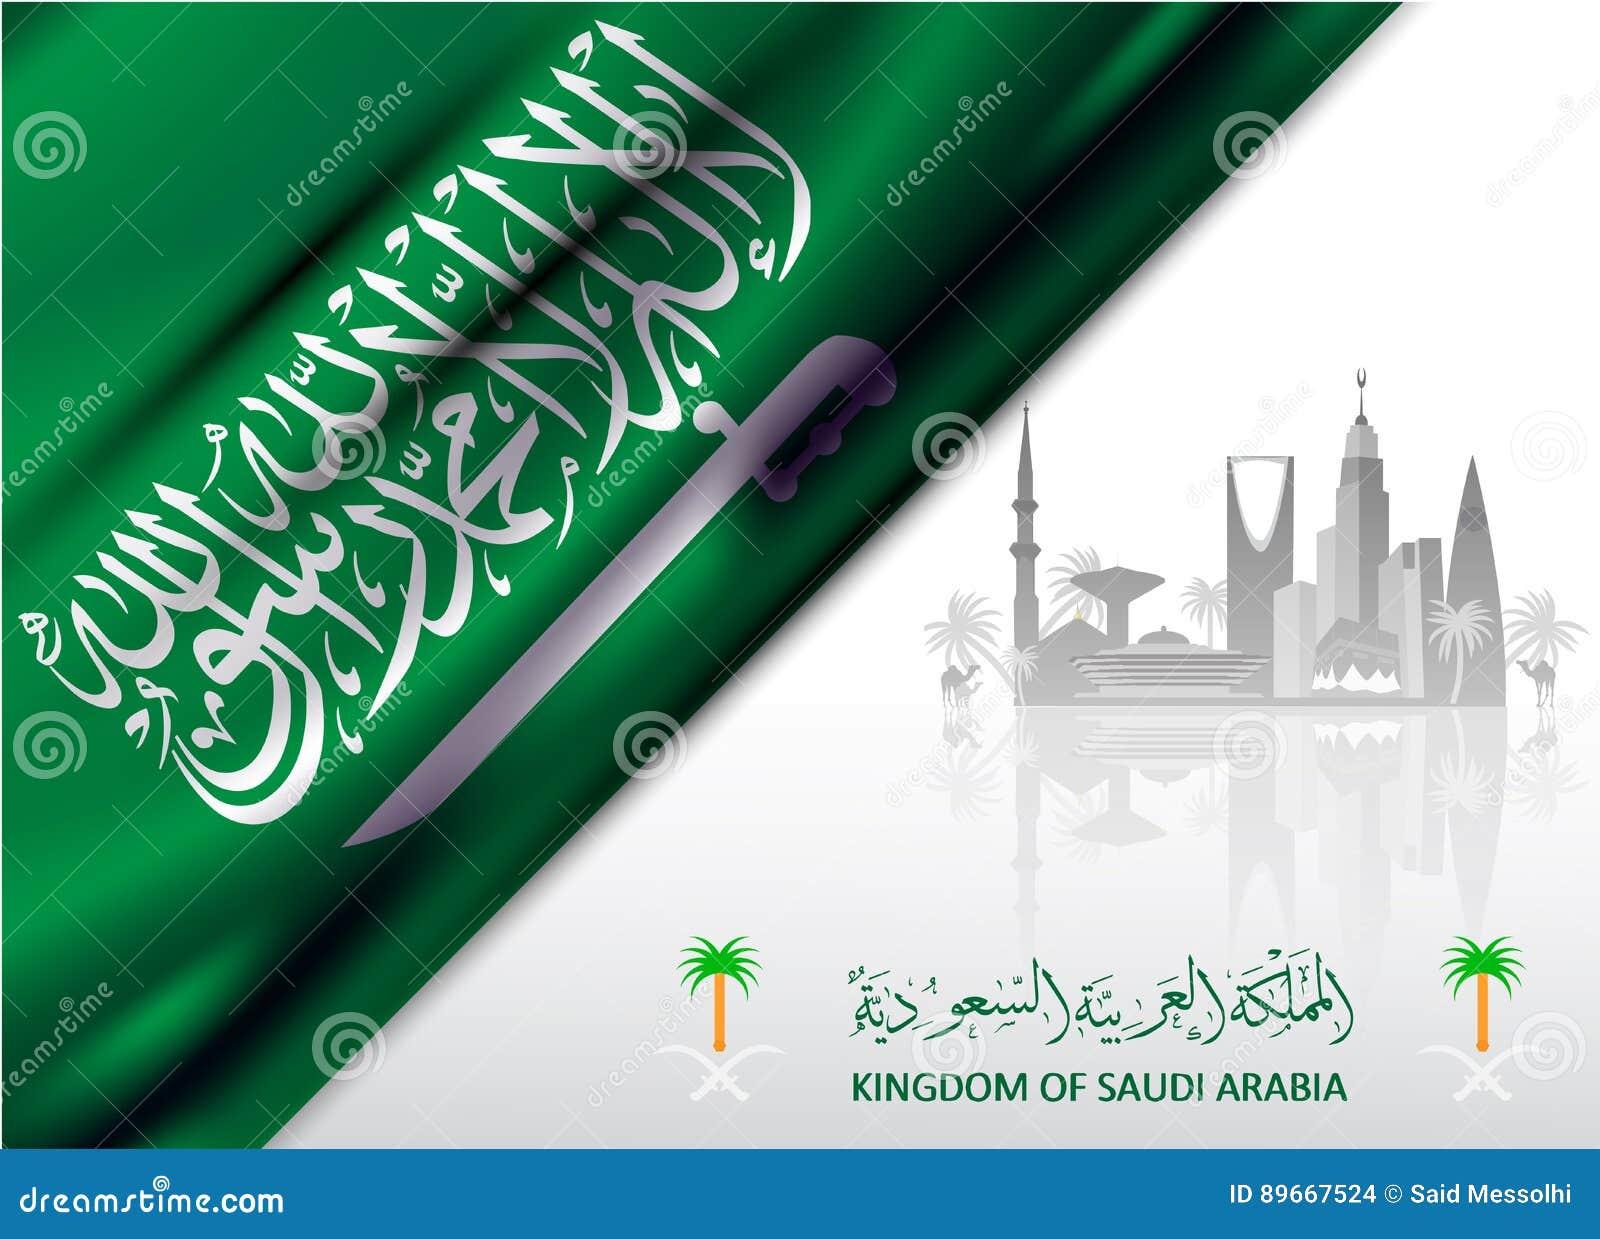 Saudi Arabia Holidays and Festivals